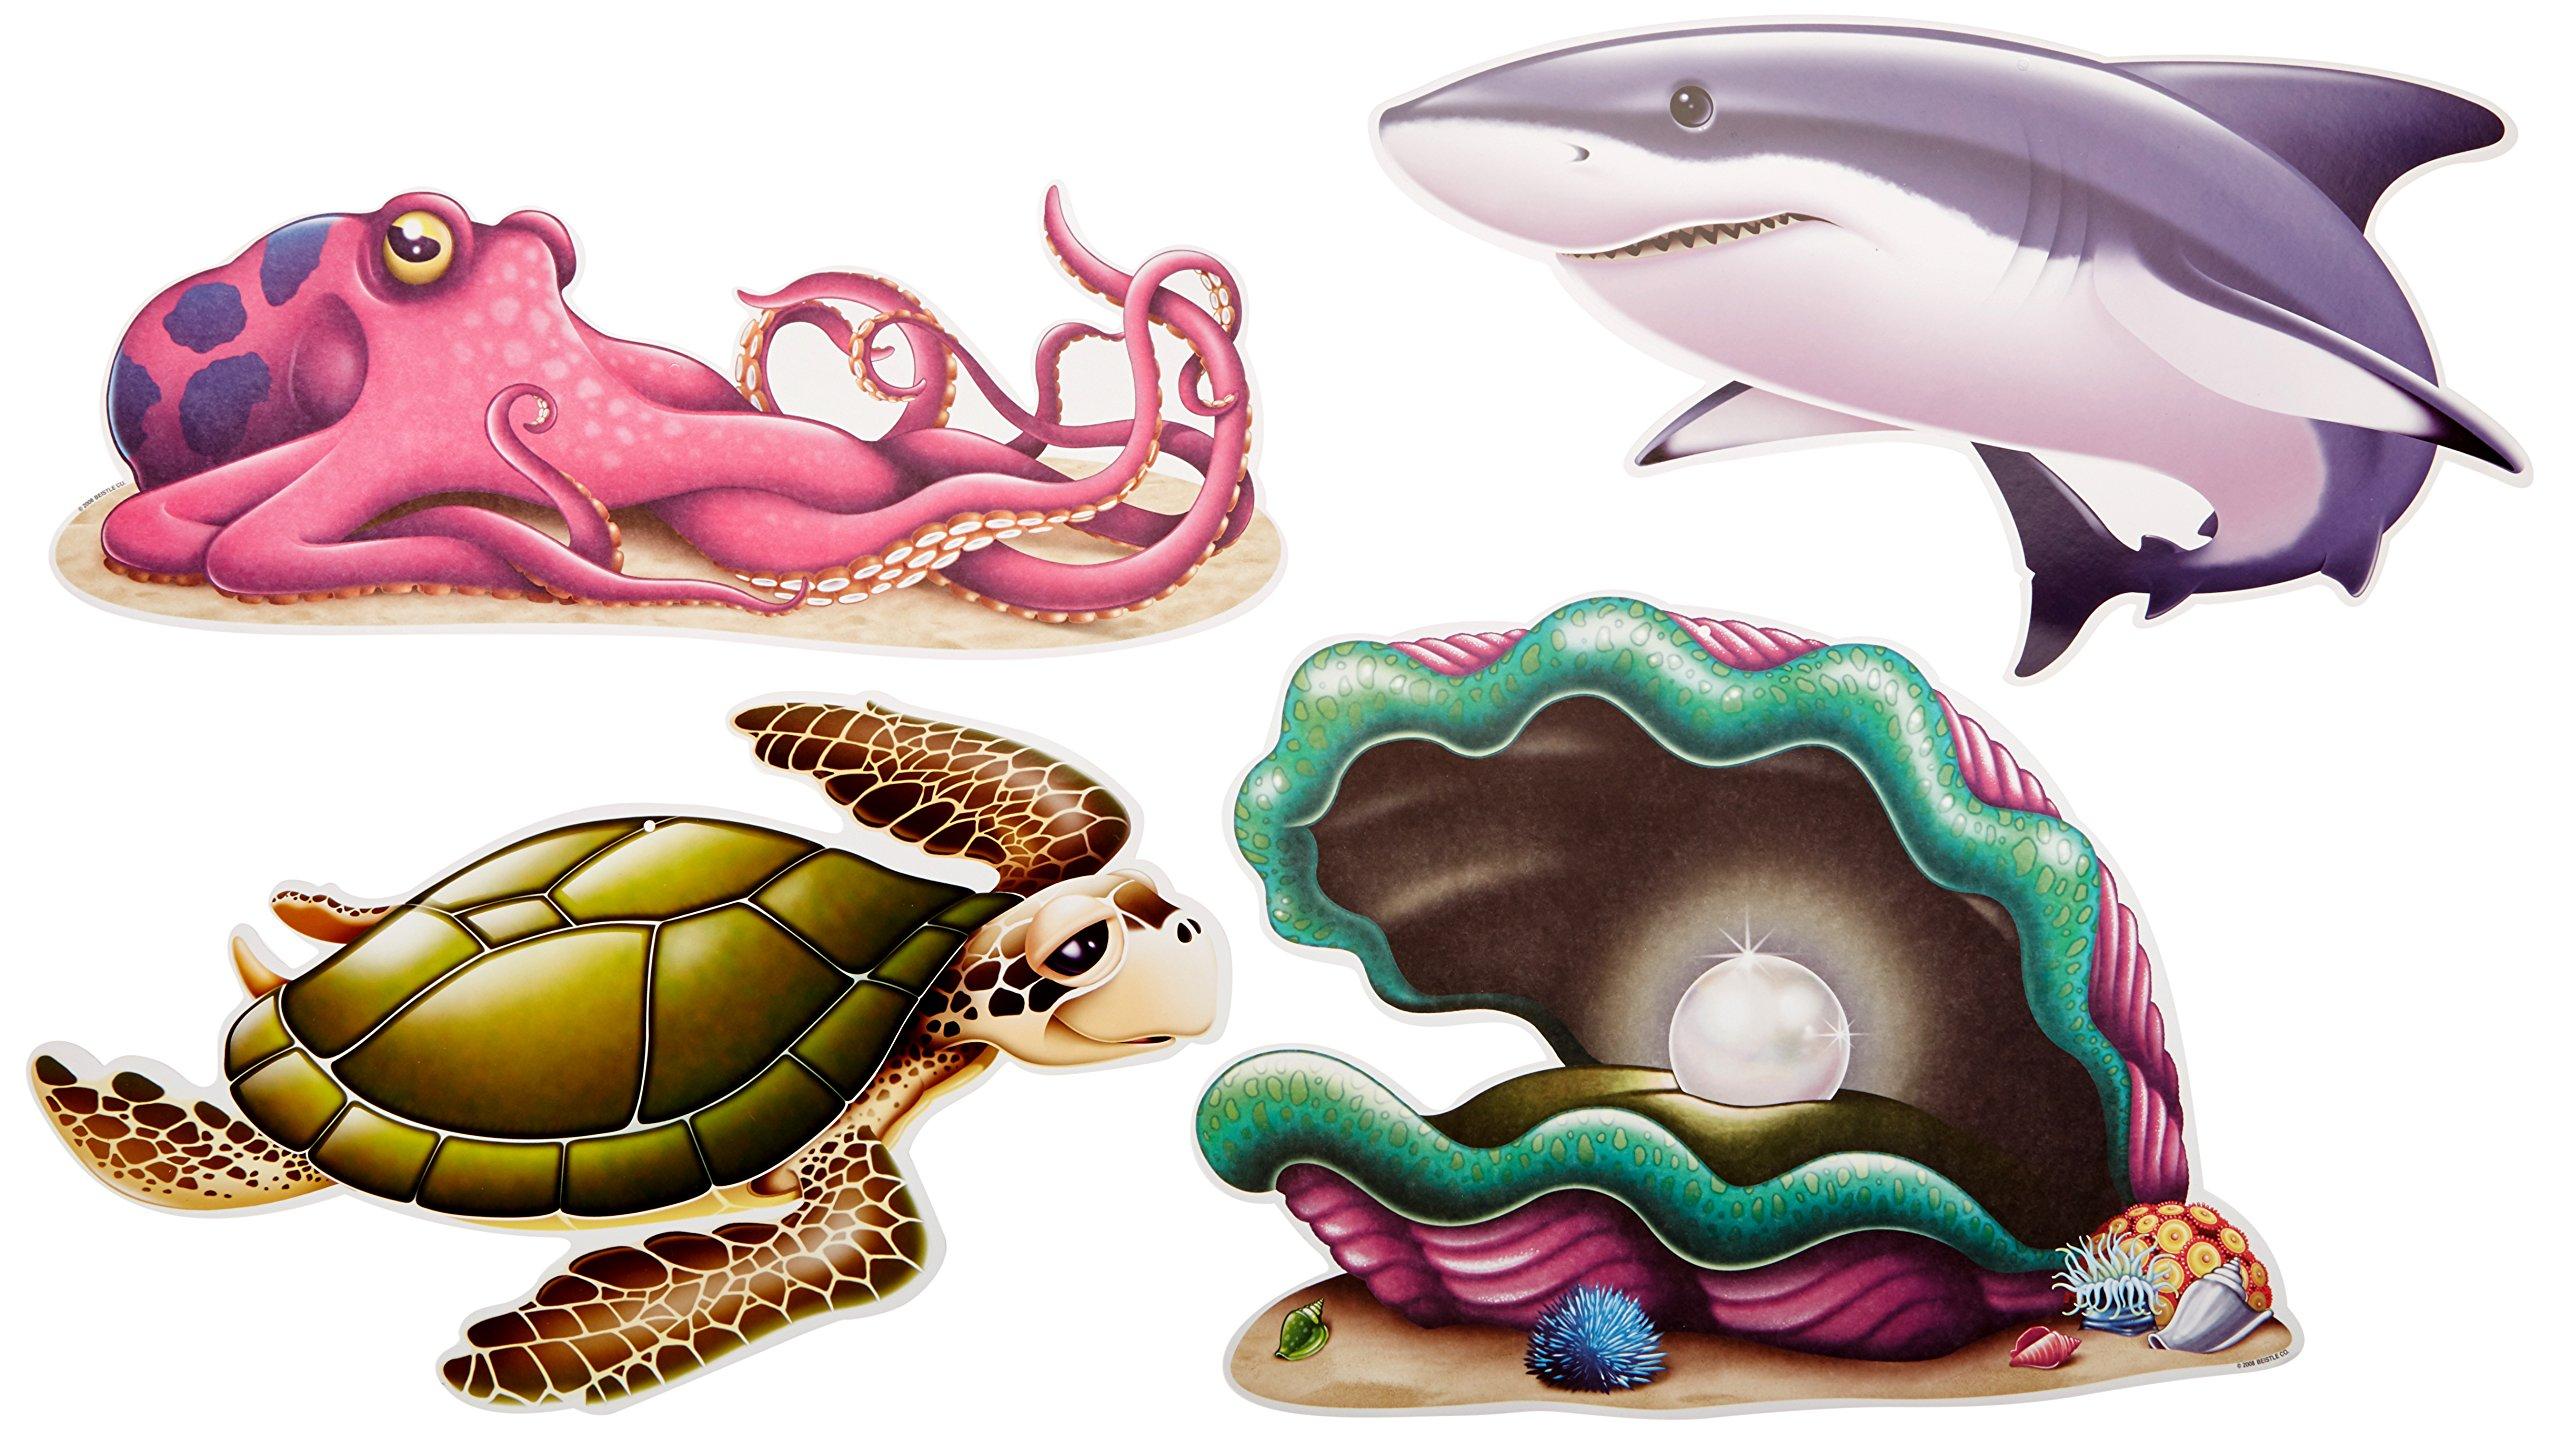 4-Pcs Beistle Sea Creatures Mini Centerpieces 5.5-Inch